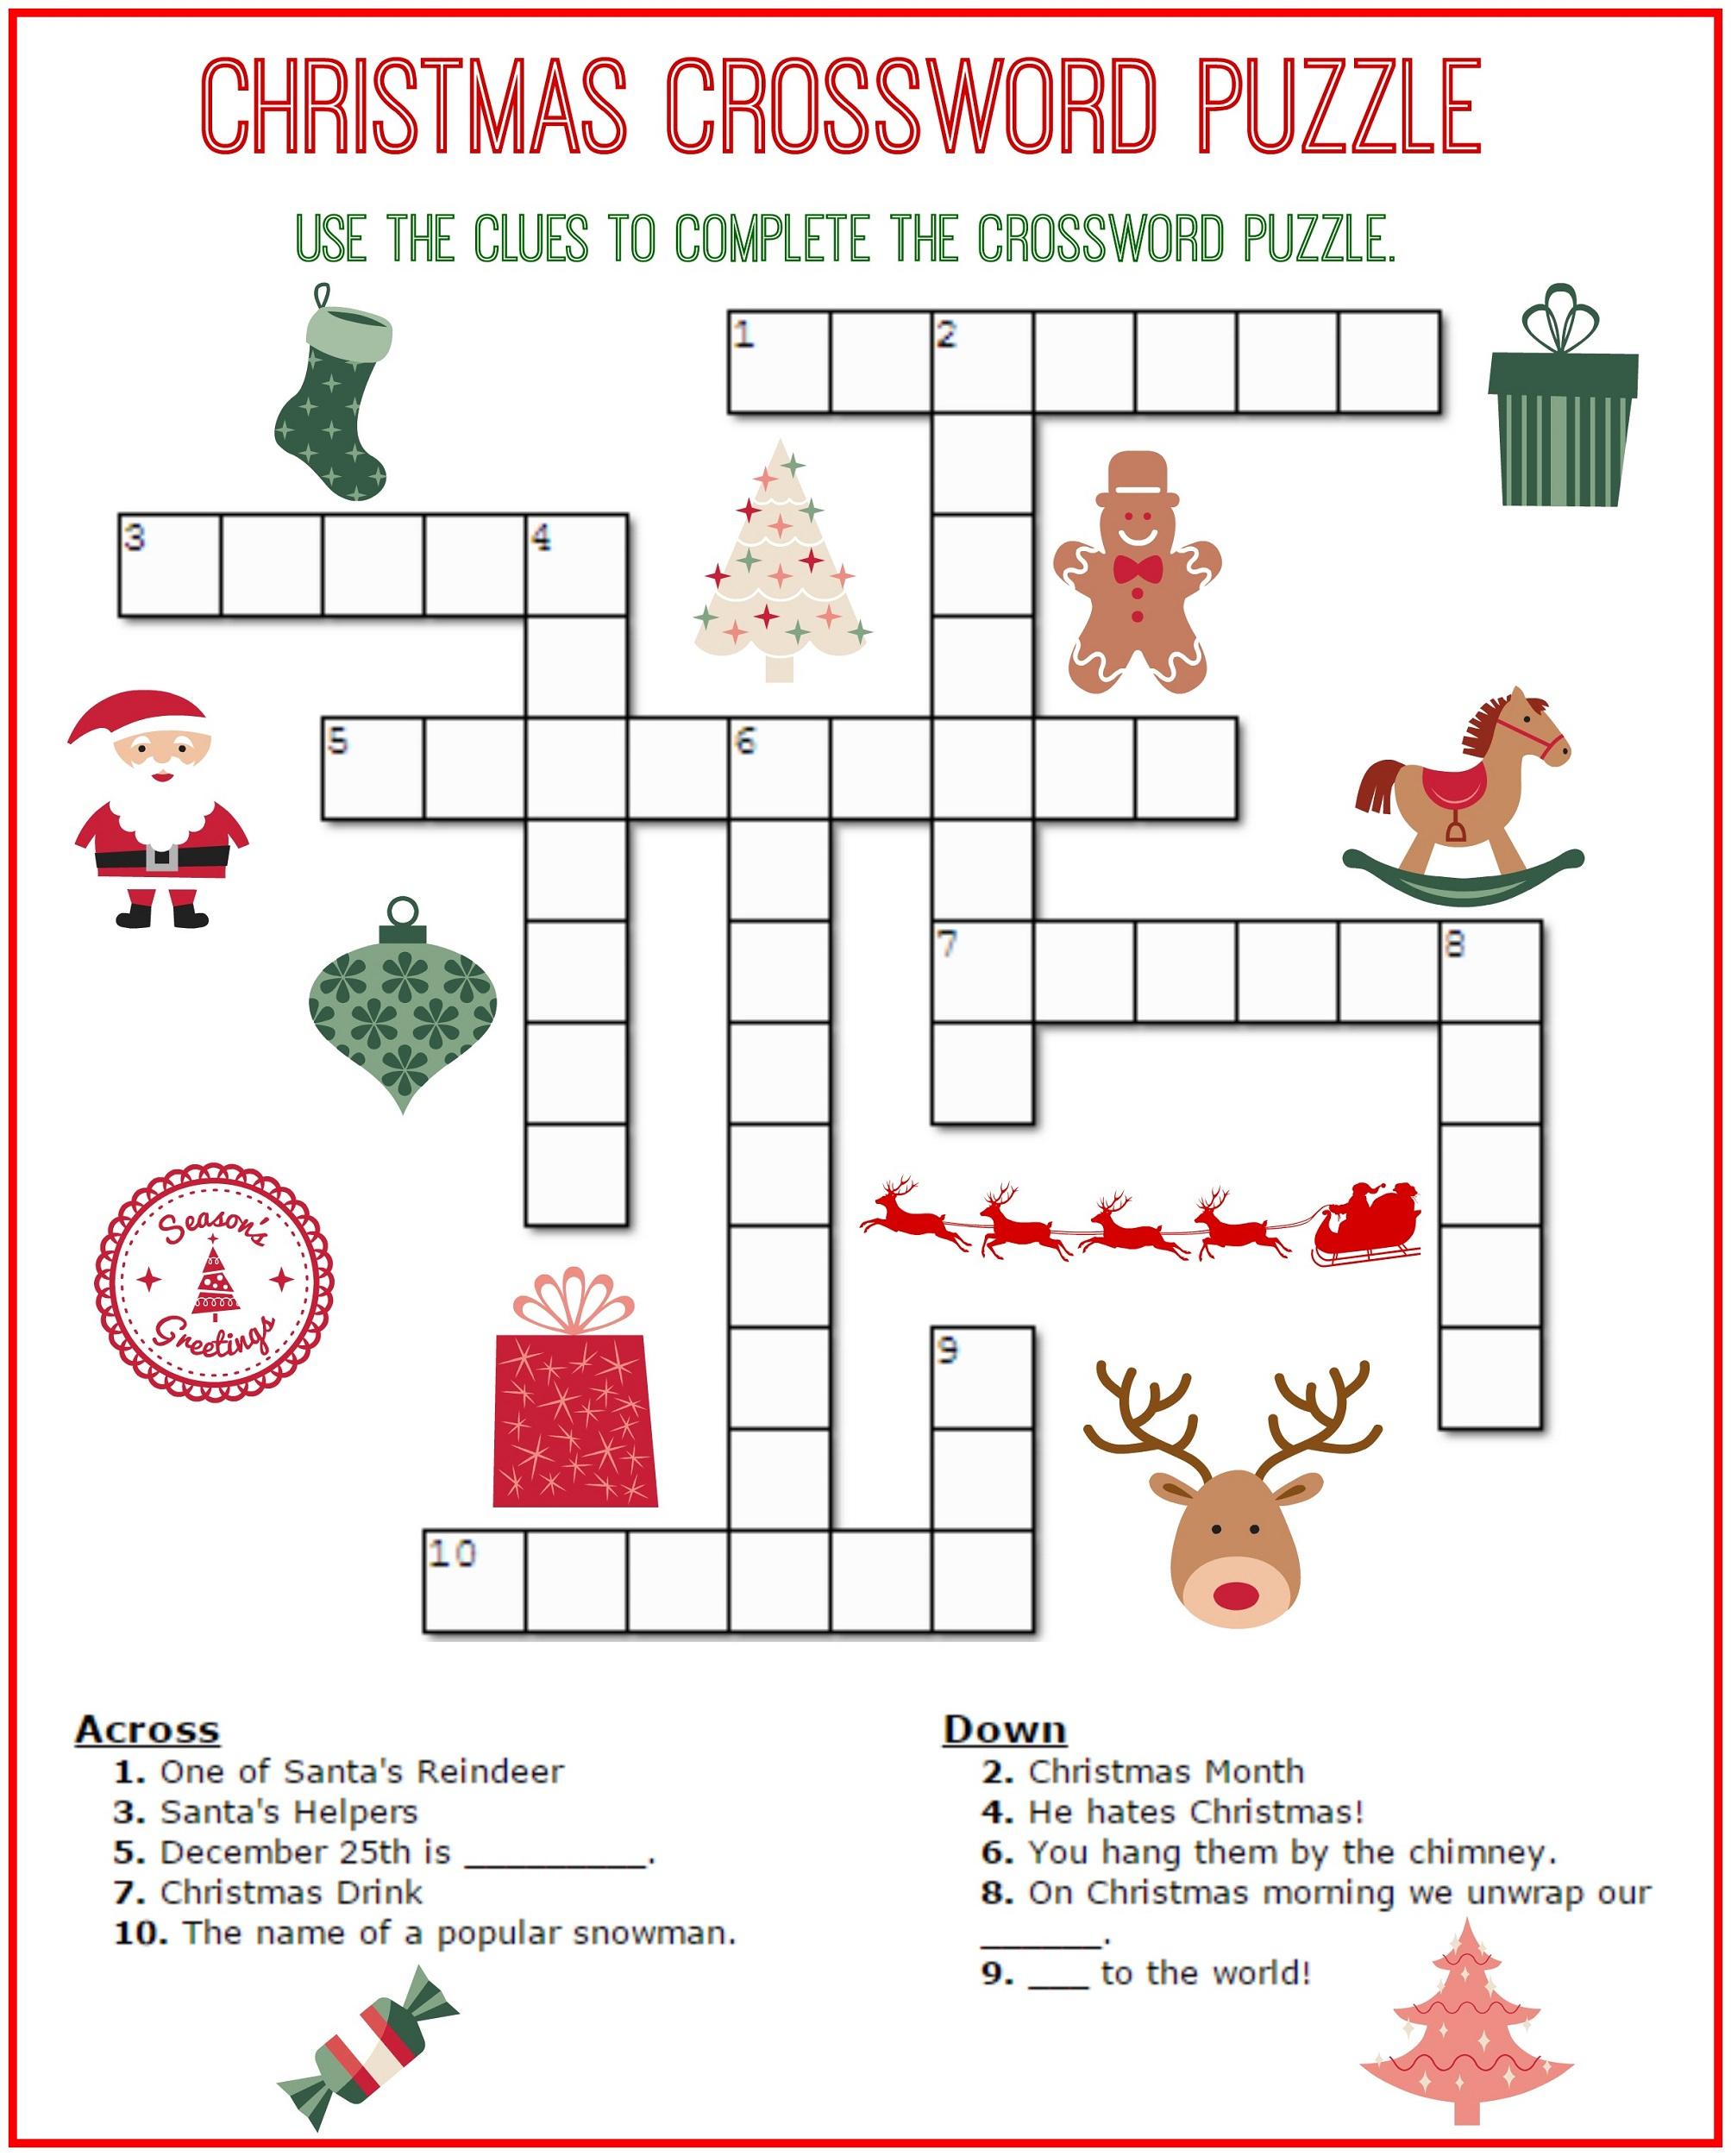 Crossword Puzzle Kids Printable 2017 | Kiddo Shelter - Free Easy - Printable Crossword Puzzles For 5Th Graders